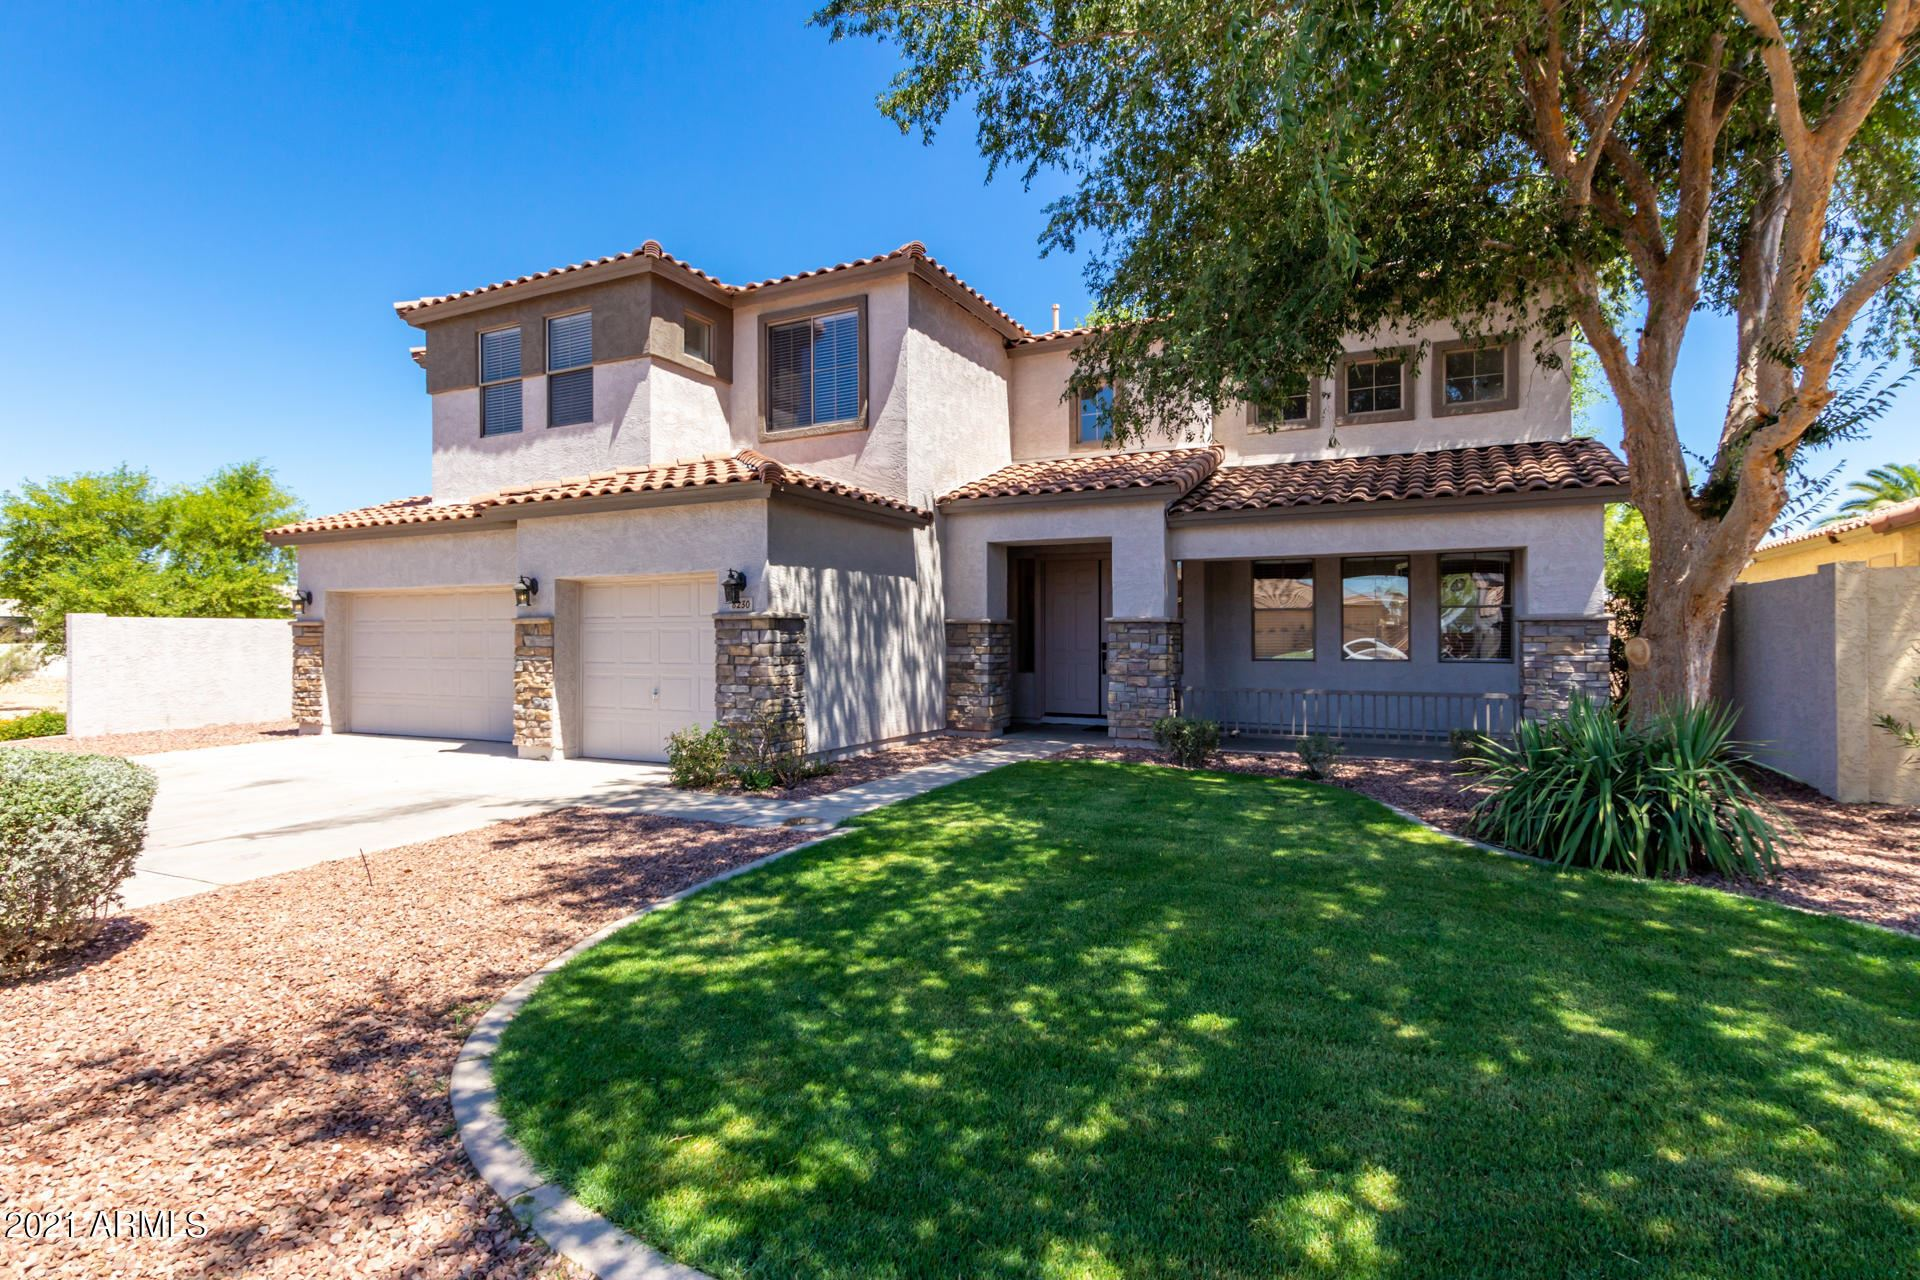 8230 W WETHERSFIELD Road, Peoria, AZ 85381 - MLS#: 6236084